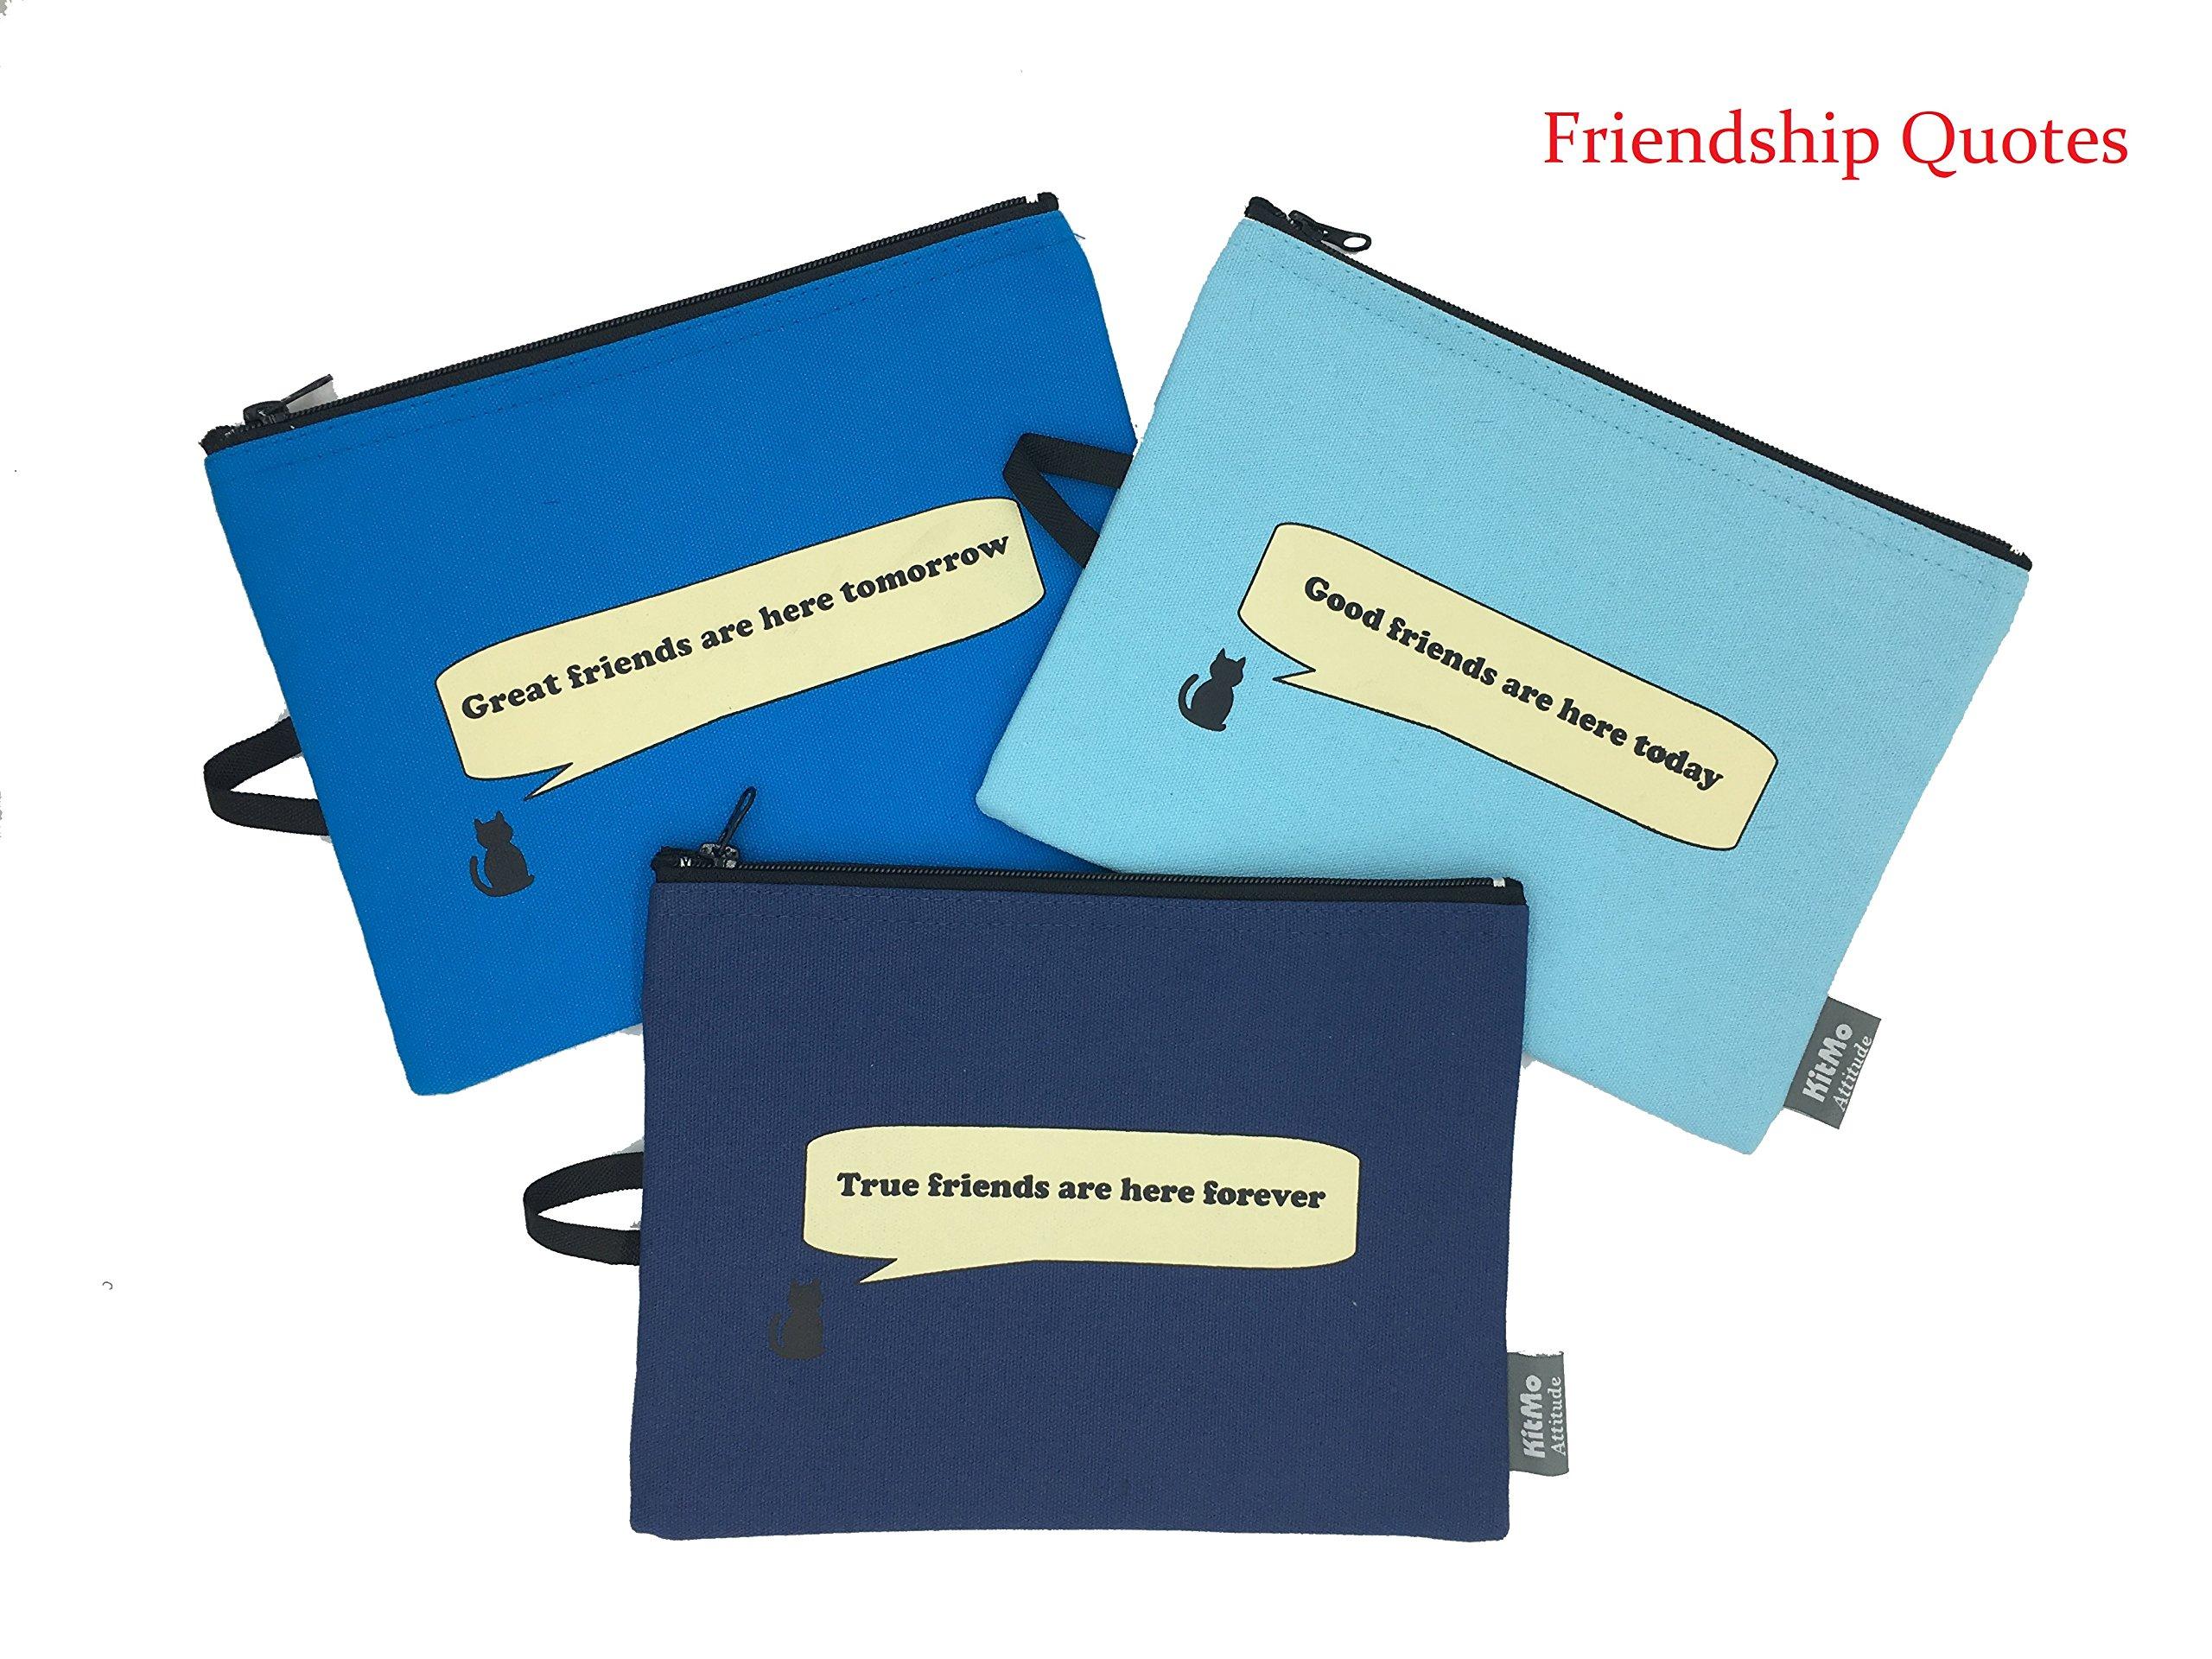 KitMo - Unique Design - 100% Cotton Travel Pouch/Makeup/ Pencil Case/Medicine Bag/Multi-Purpose Organizer - for School/Airplane/ Personal Items Storage - Gift (Set of 3 pcs) (Blue)